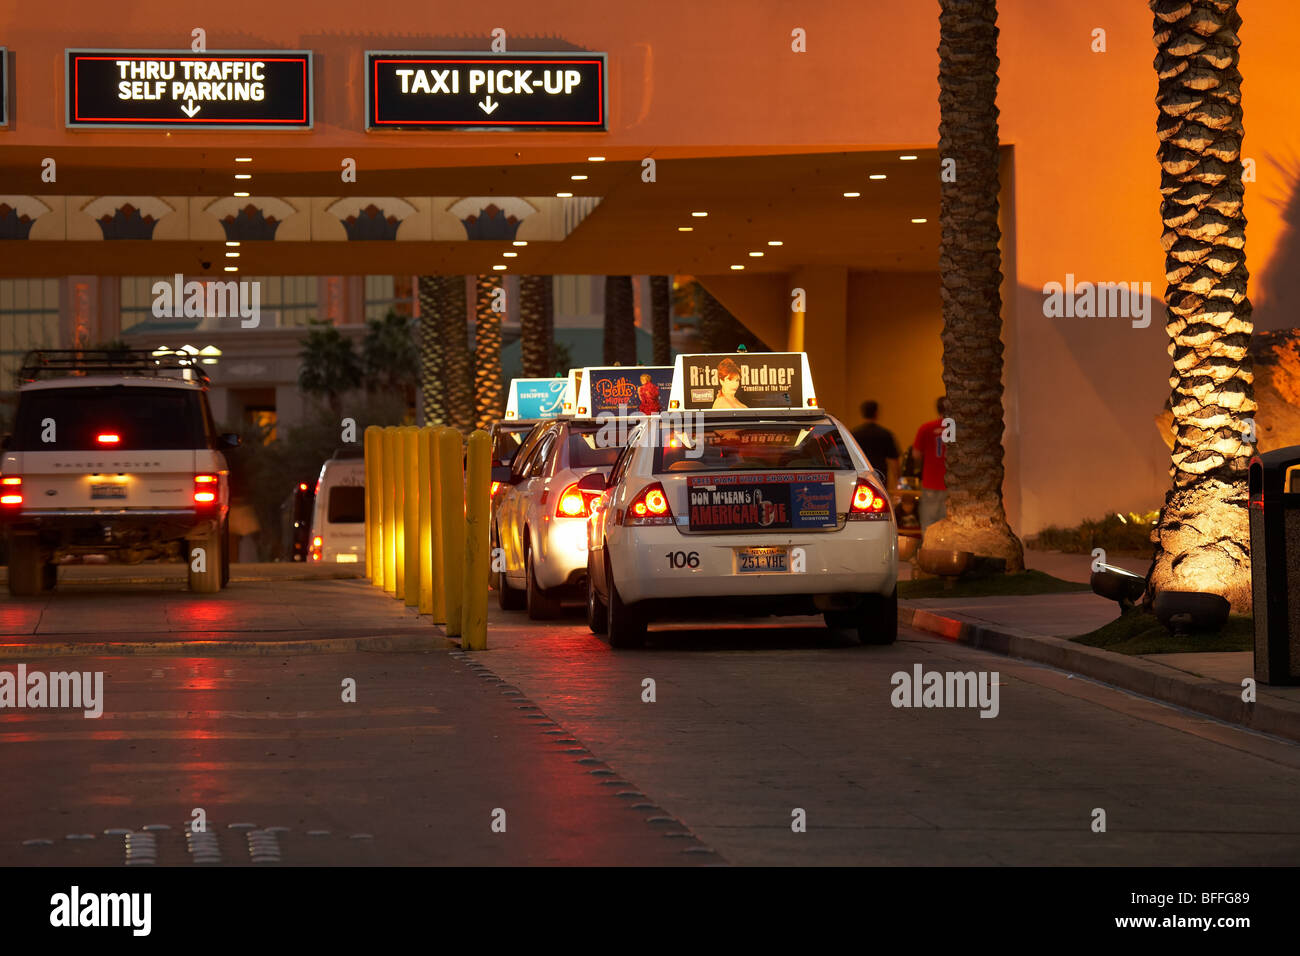 Cars parking in Luxor hotel casino Stock Photo: 26772265 - Alamy